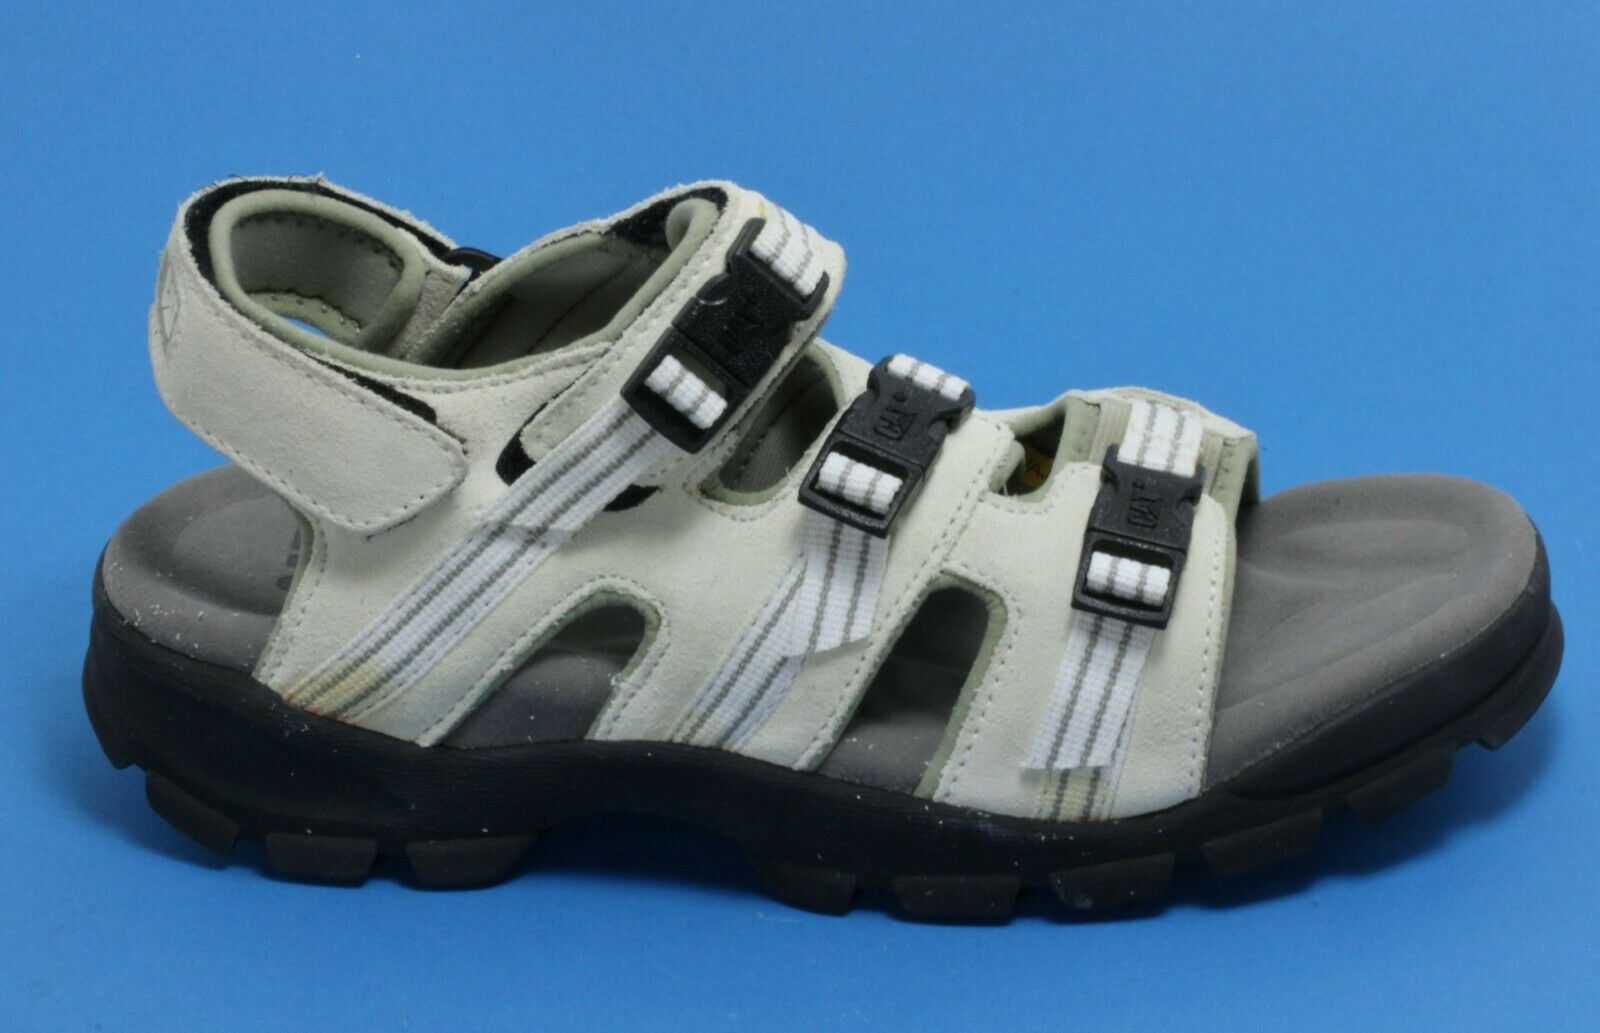 704 Sandal Trekking Touch Fastener Outdoor Shoes Summer Leather Caterpillar 44